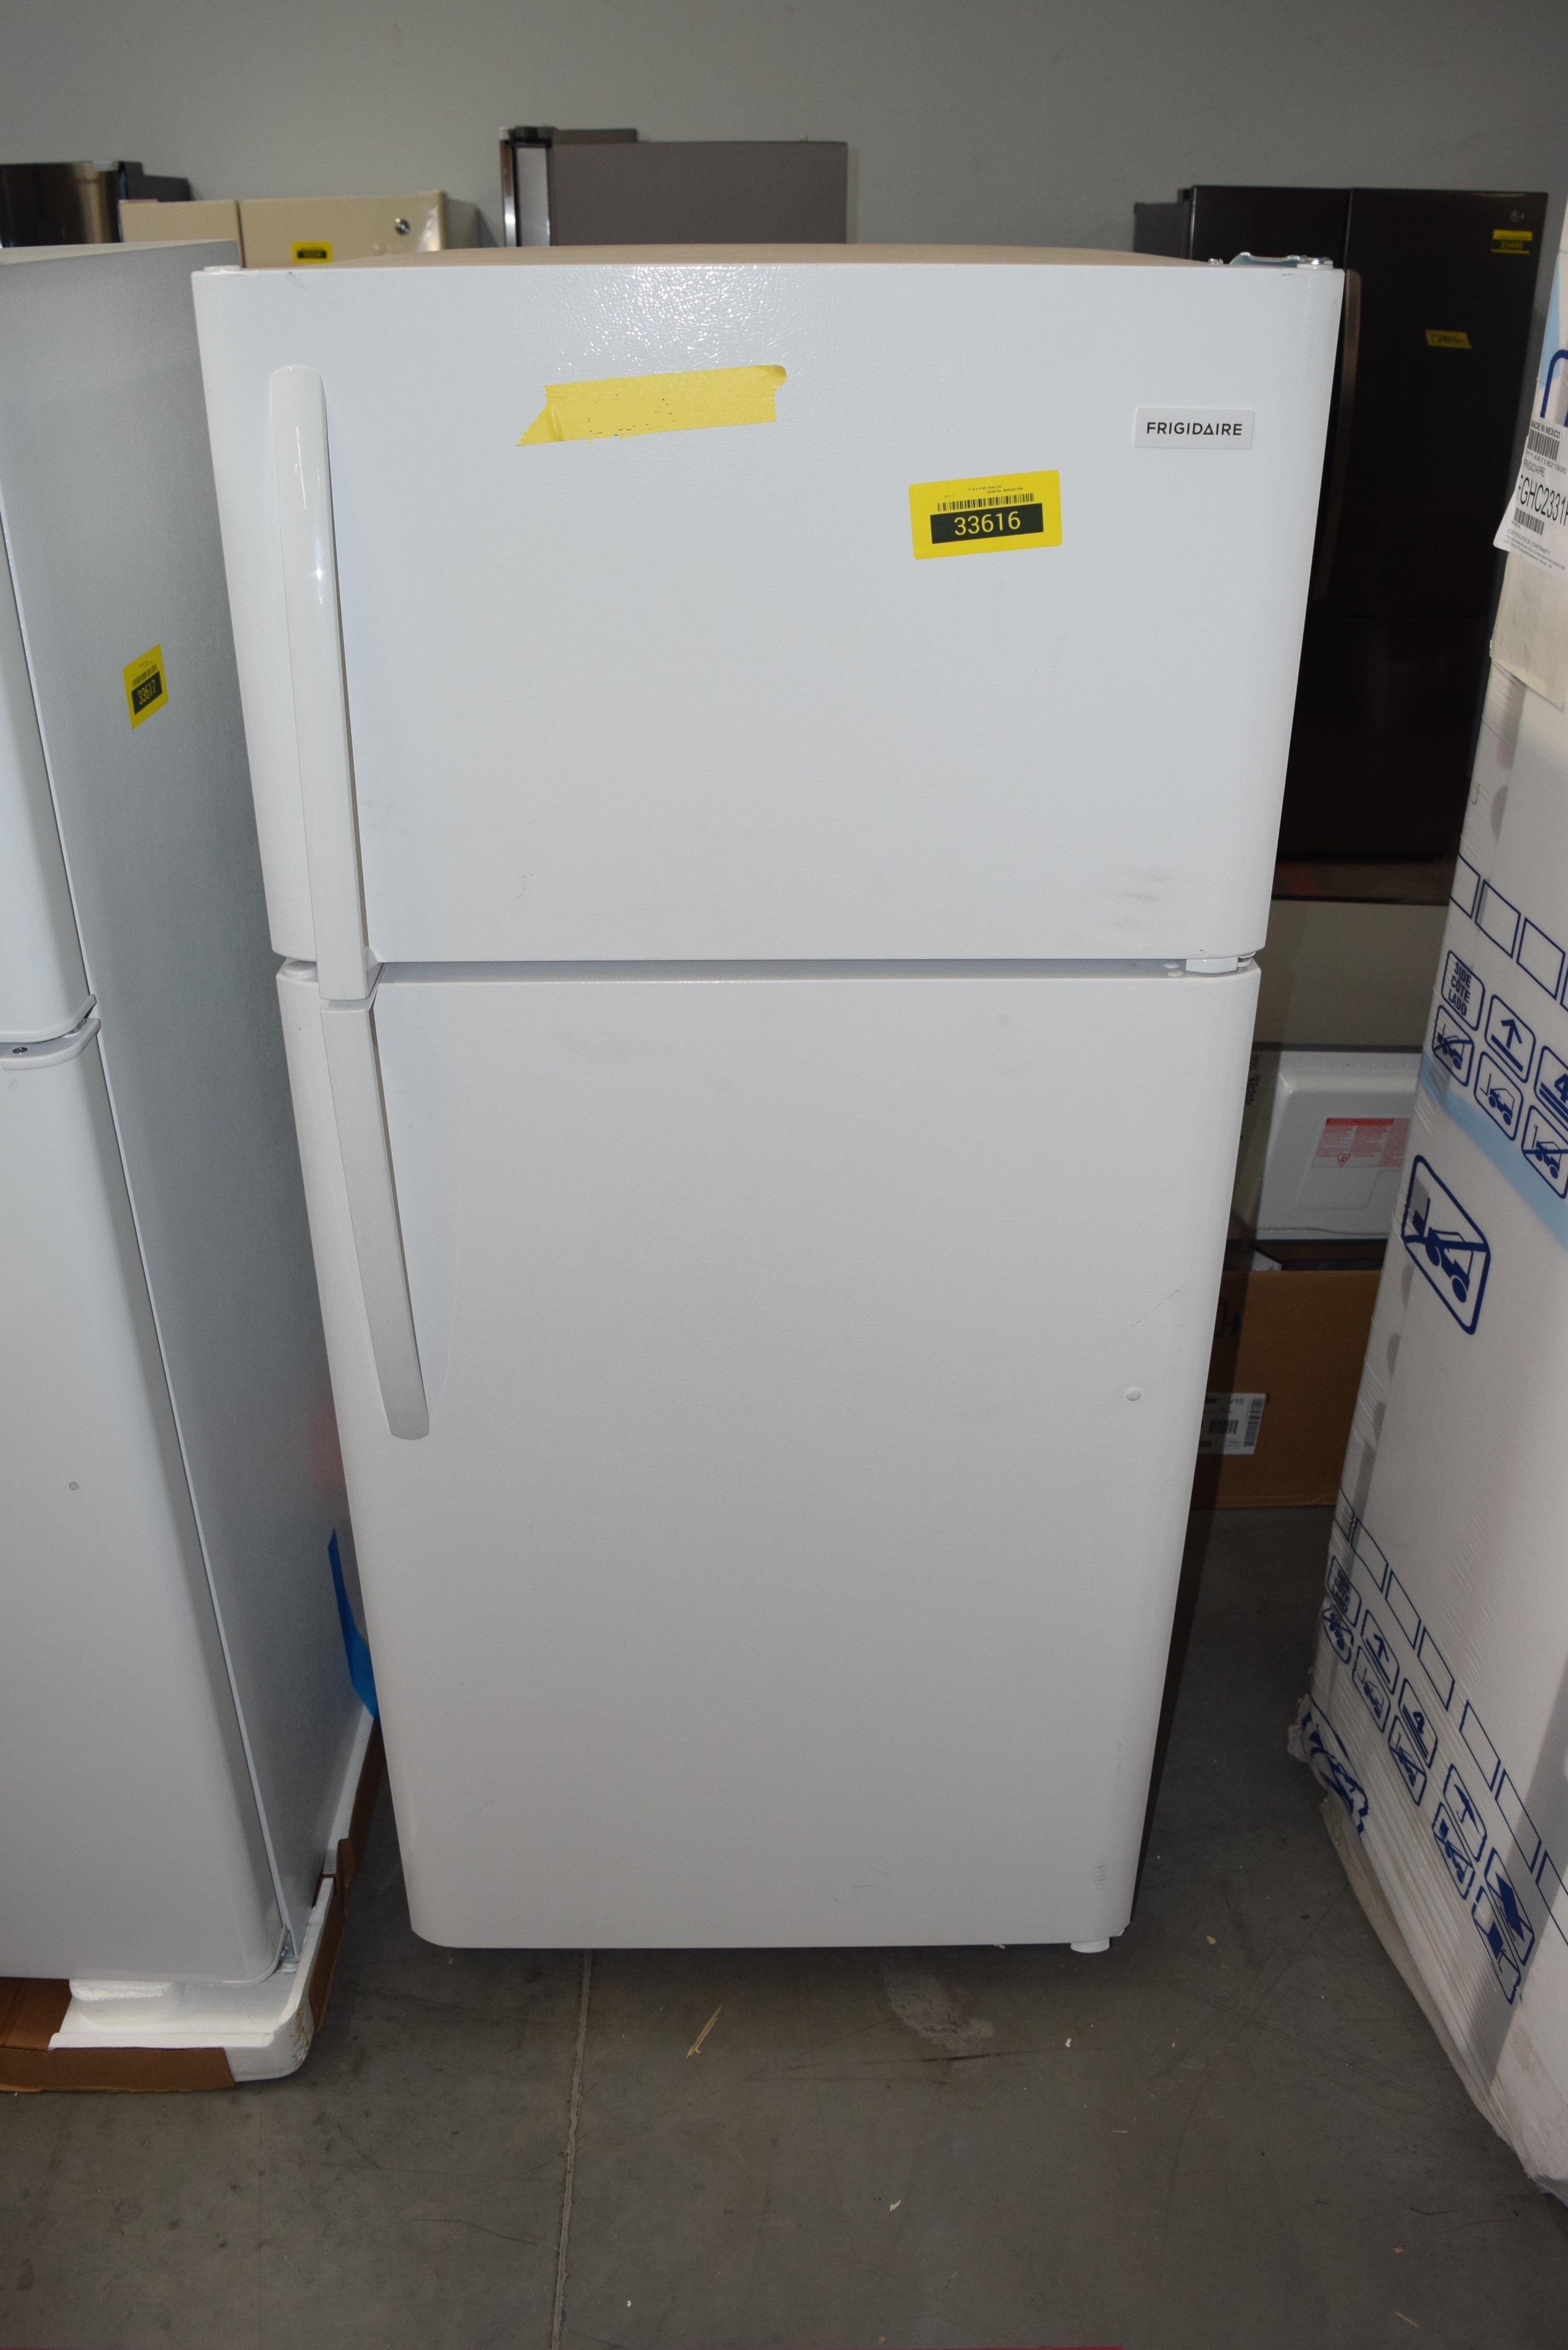 Frigidaire FFTR1814TW Top-Freezer Refrigerator White